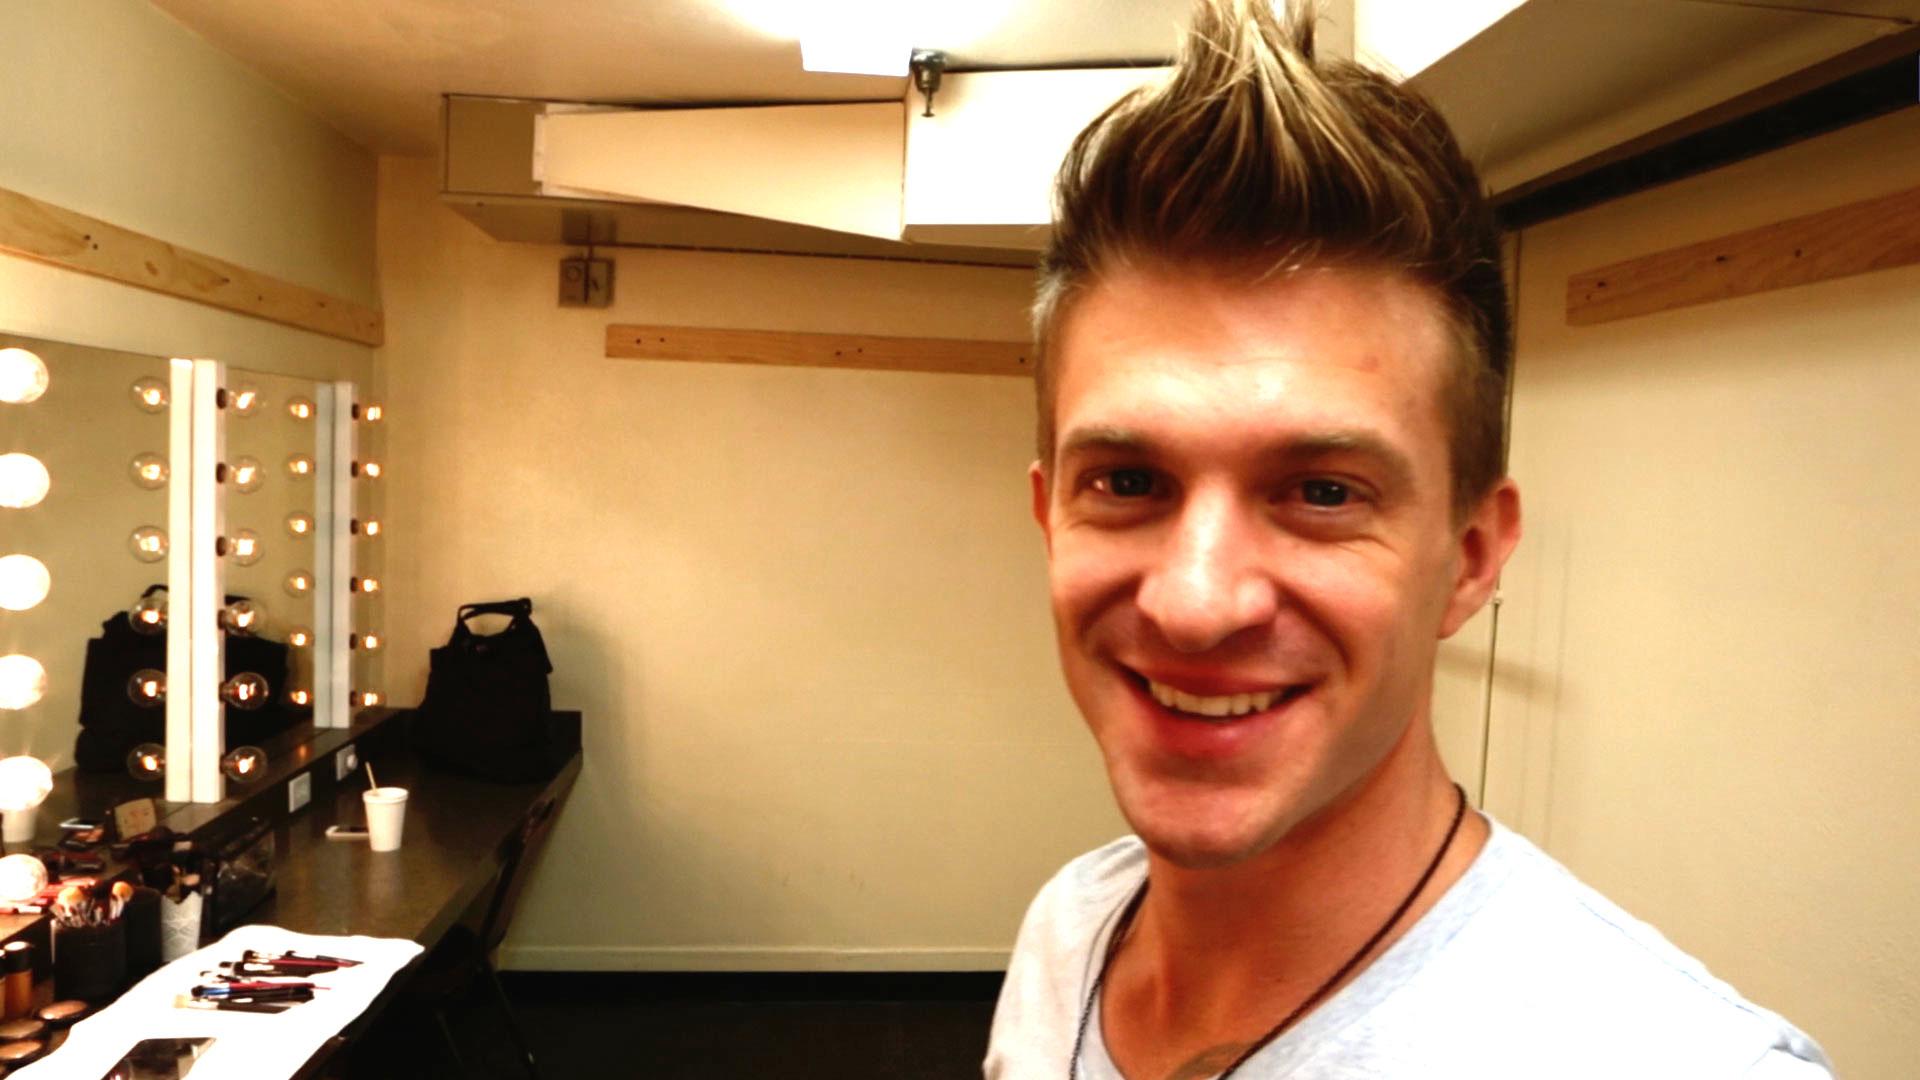 Jake Barker Gets a Haircut